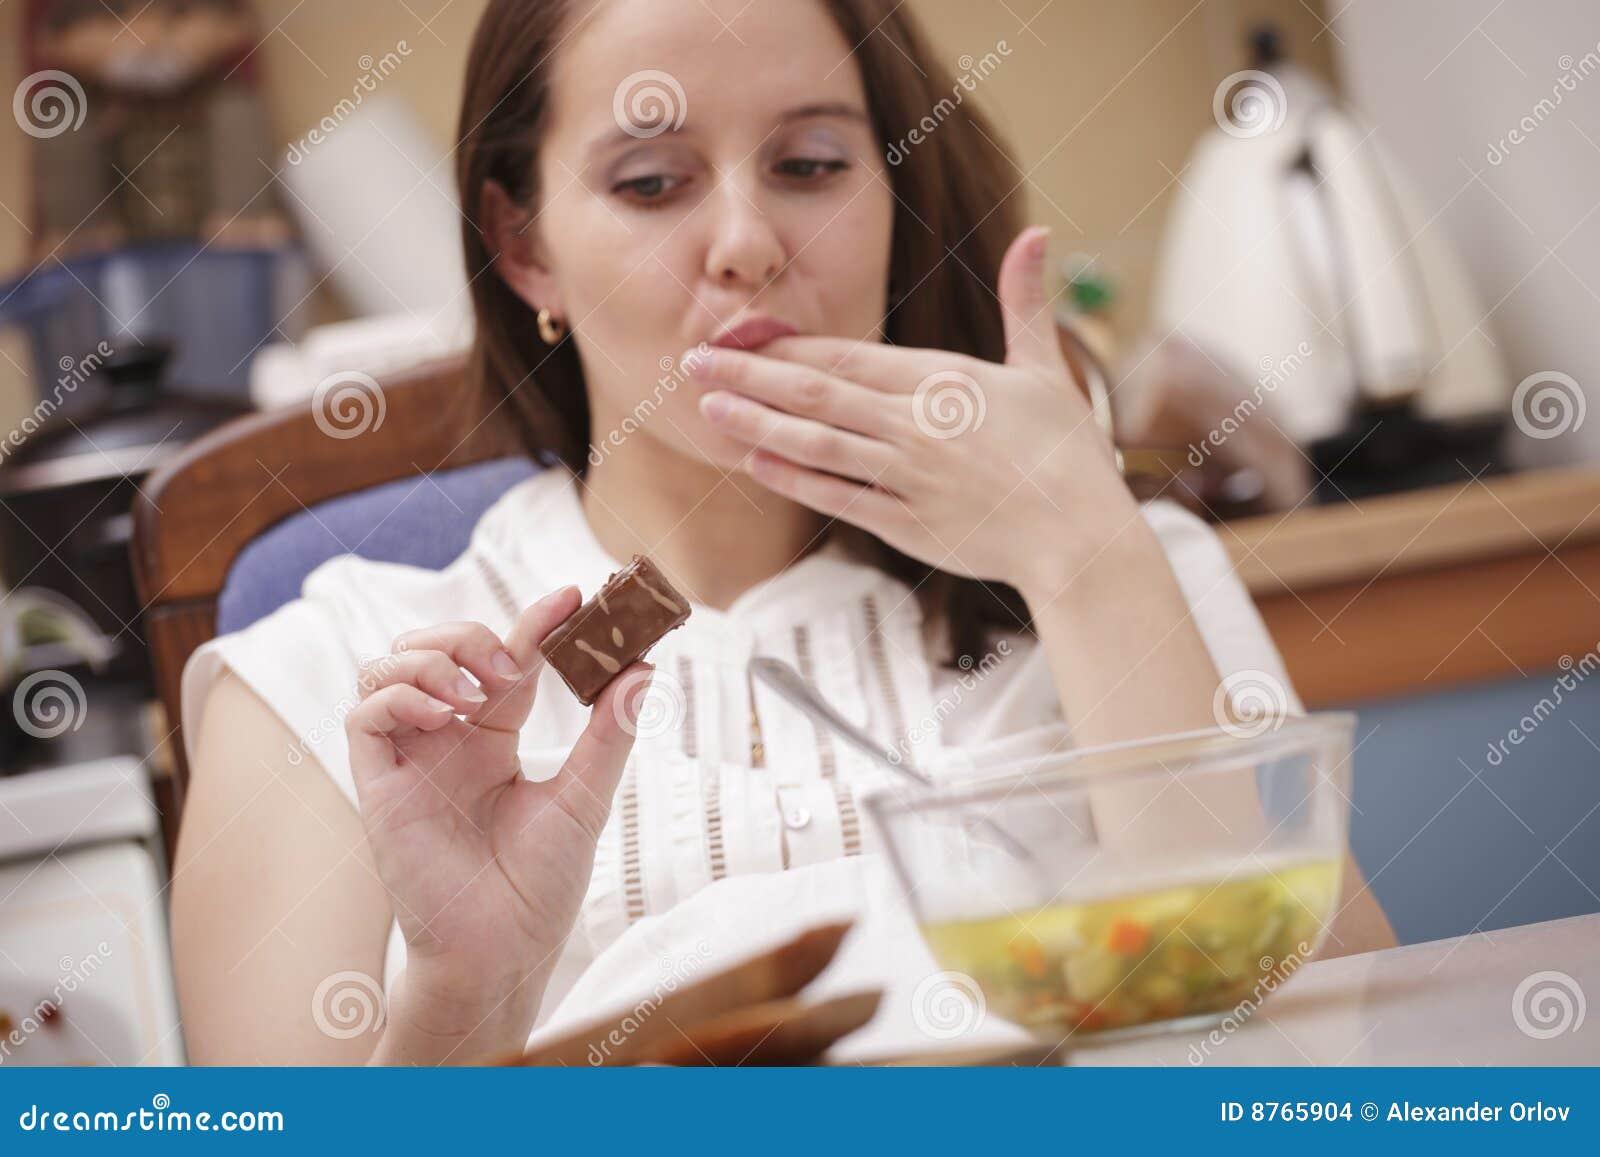 Woman looking at chocolate